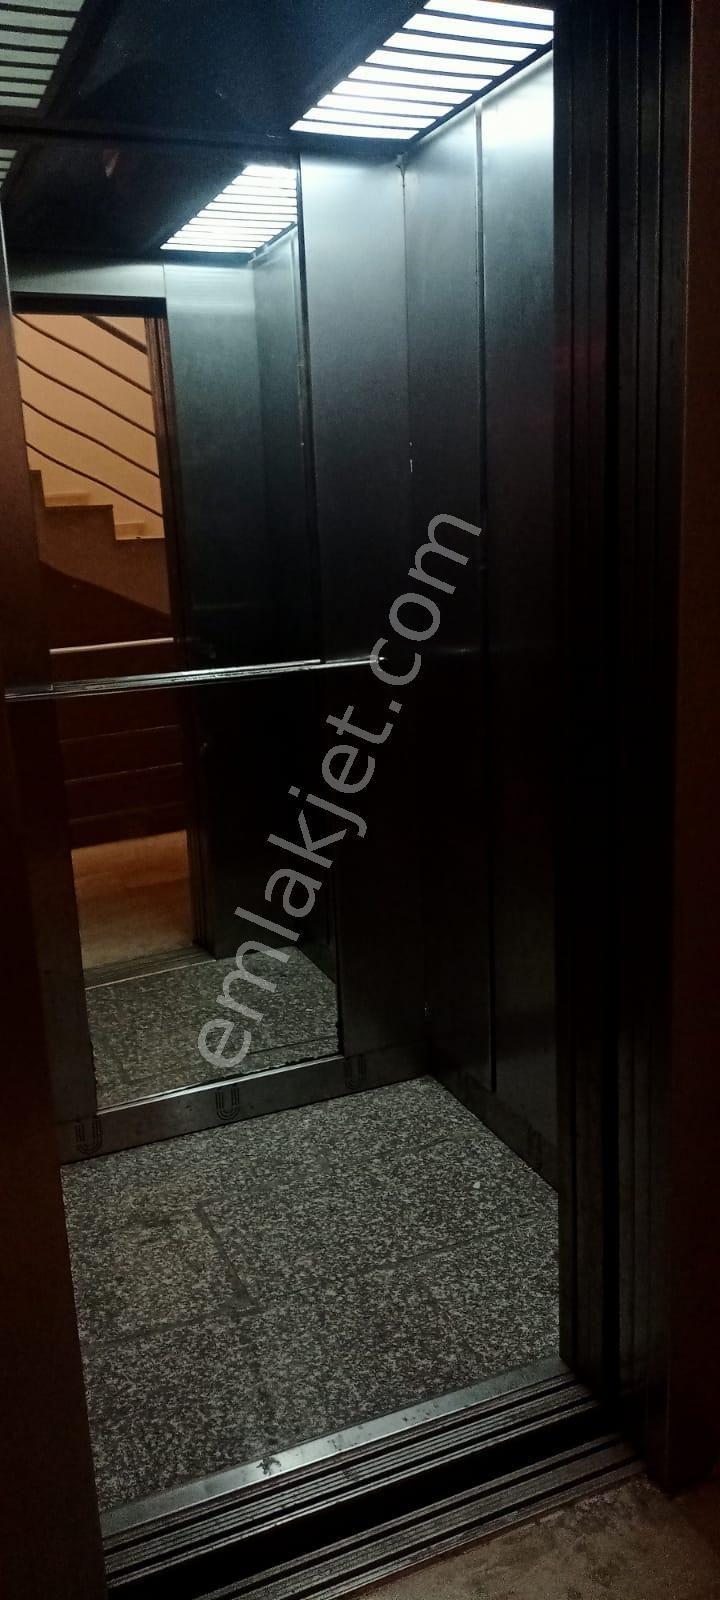 https://imaj.emlakjet.com/listing/9354642/023C541358AFE56D61326C8C641D1DDC9354642.jpg